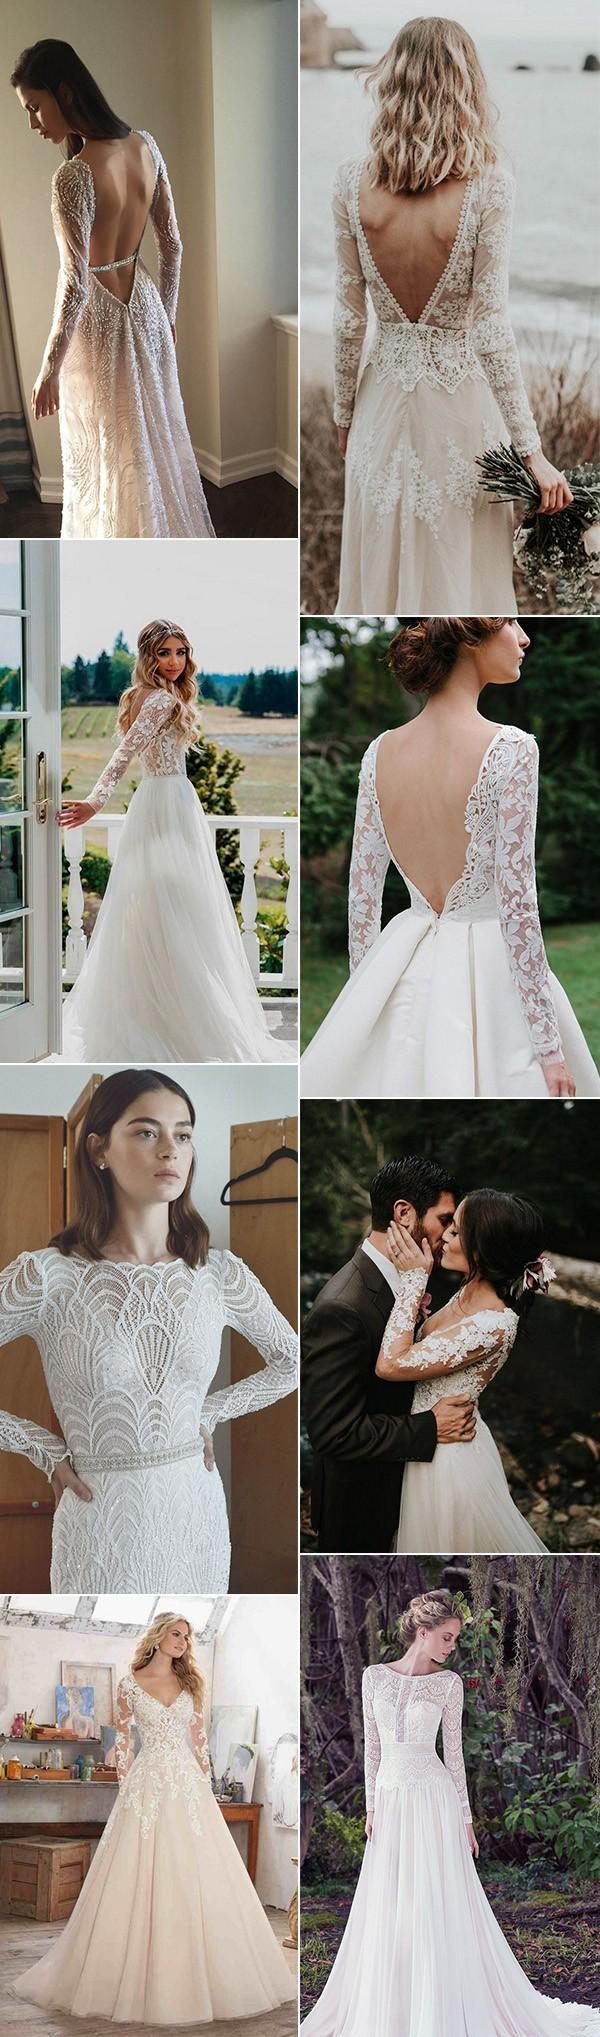 trending wedding dresses with long sleeves